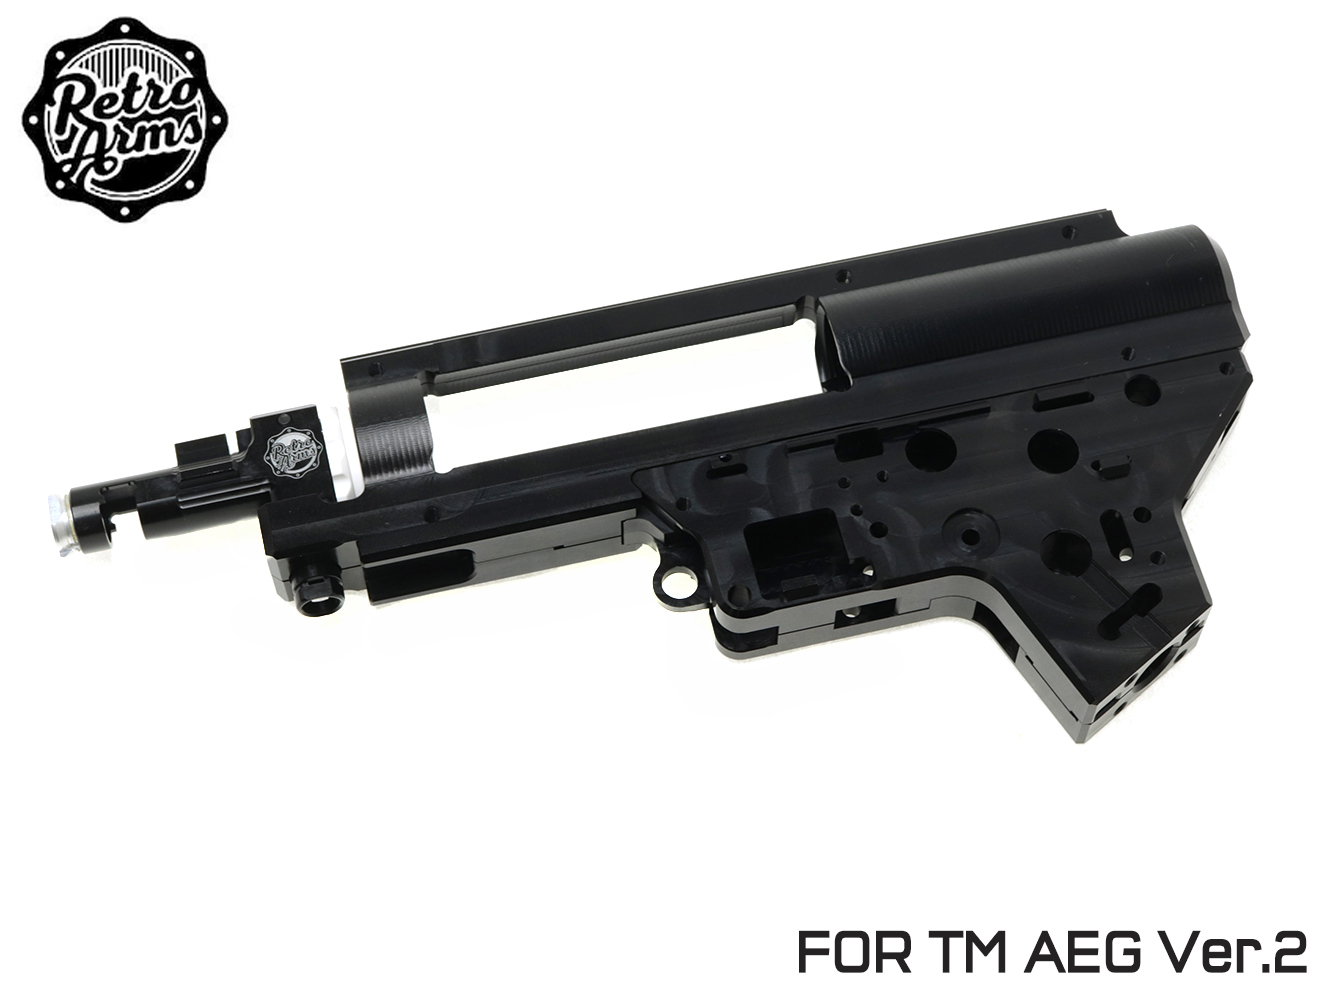 9mmベアリング仕様◆ギアボックス/バージョン2/STD電動ガン/ホップチャンバー CNC ARMS RETRO スプリットメカボックス QSC Ver.2